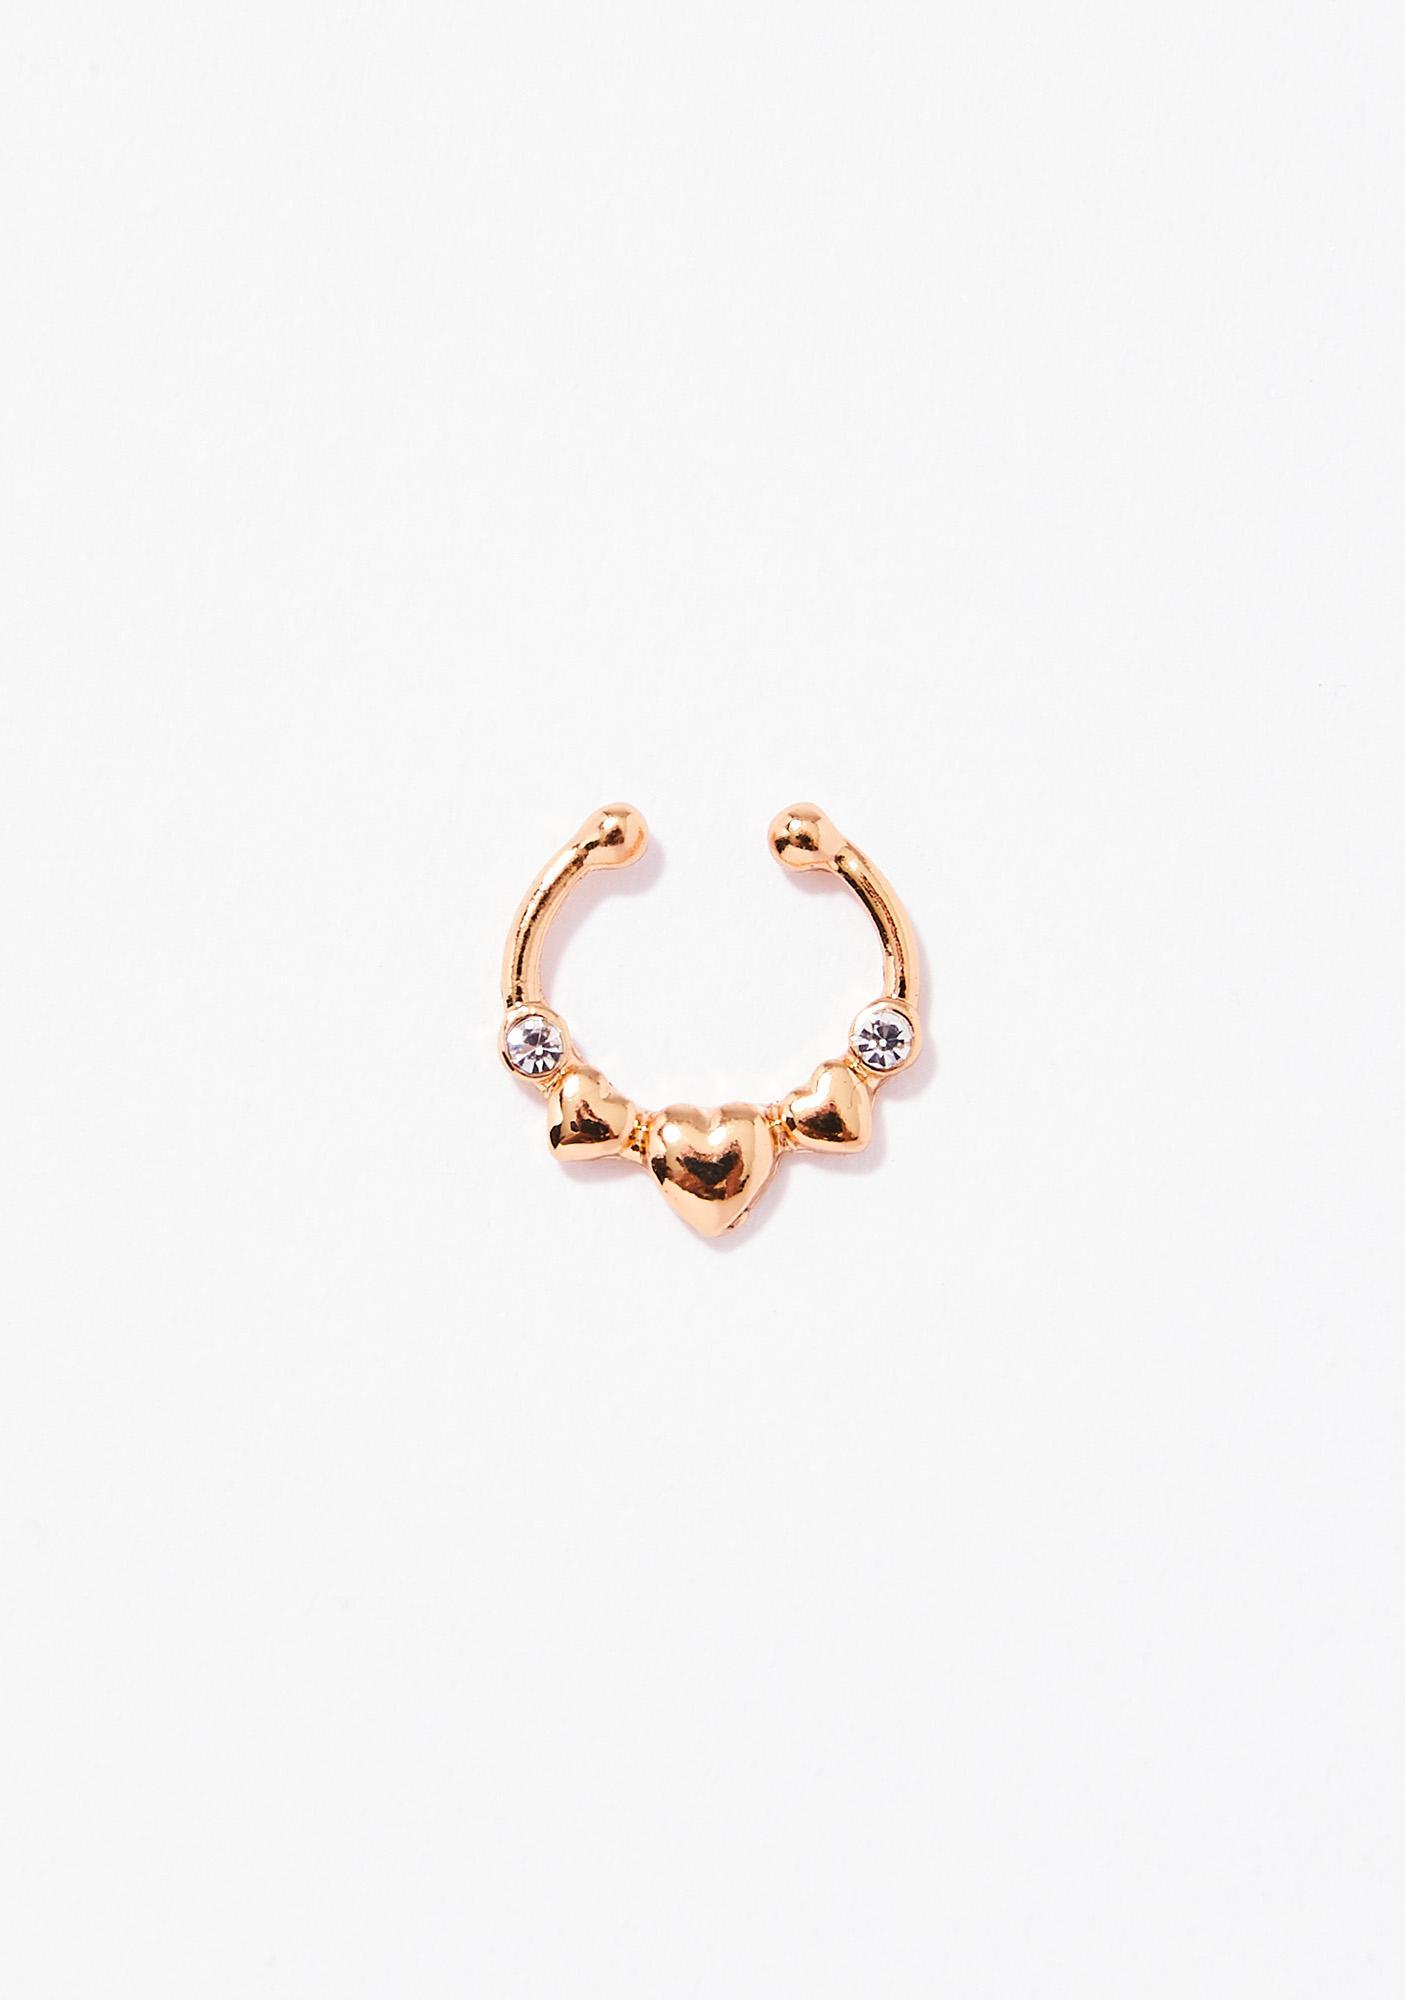 All My Love Septum Ring